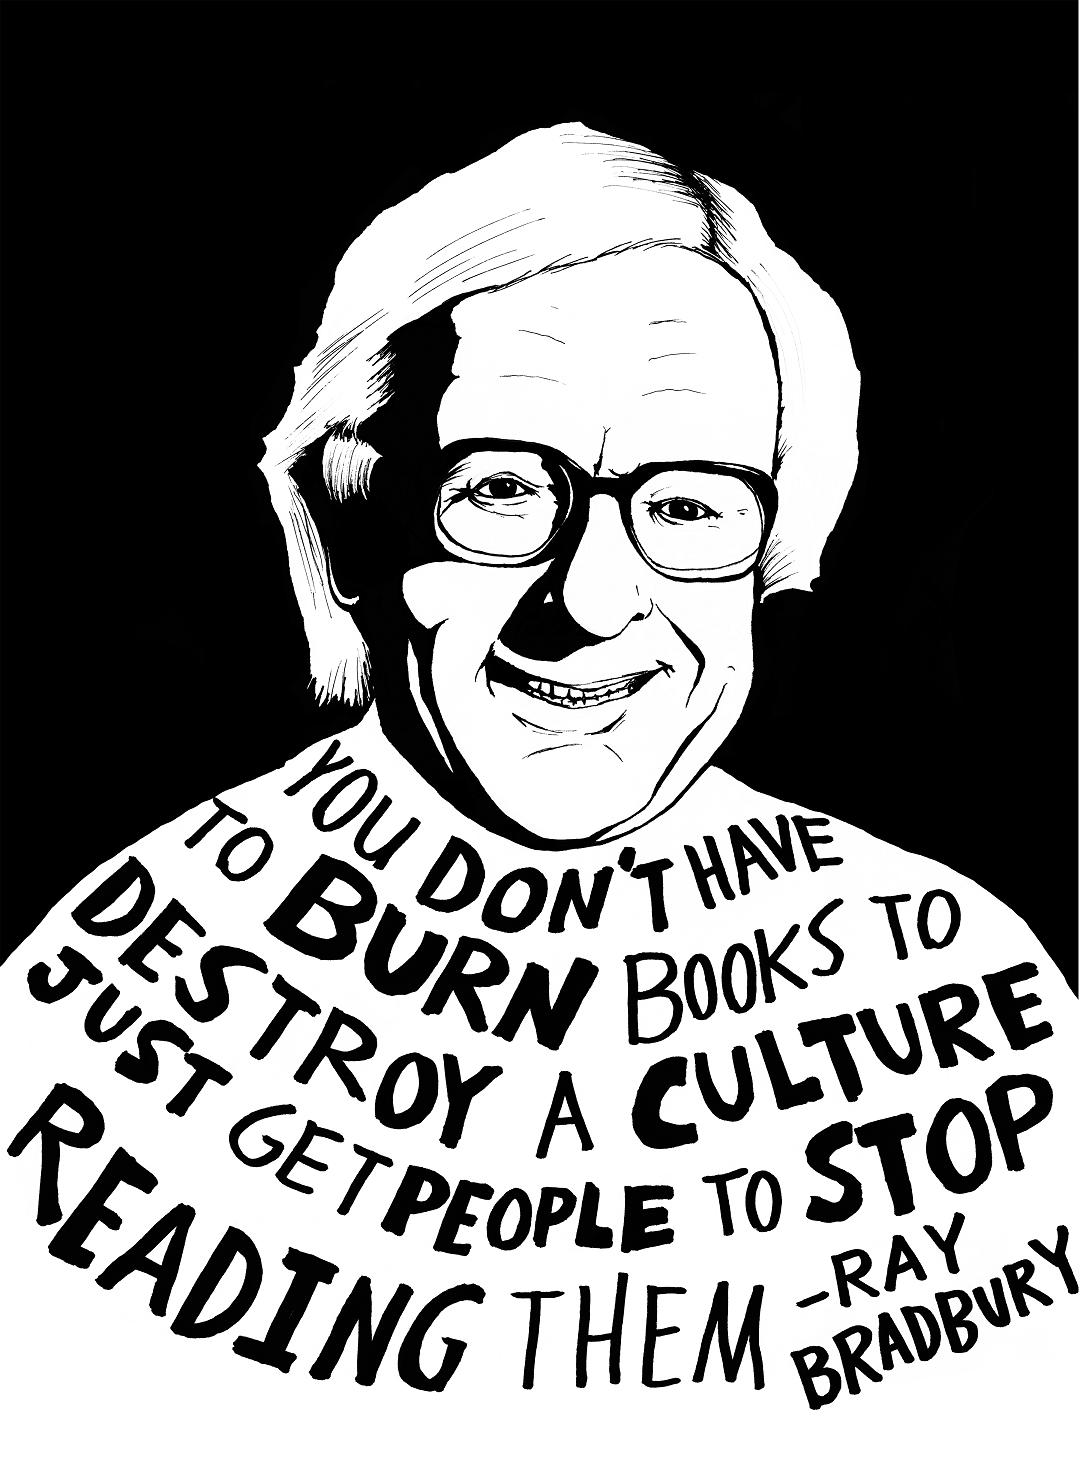 Ray Bradbury depicted in art by Ryan Sheffield